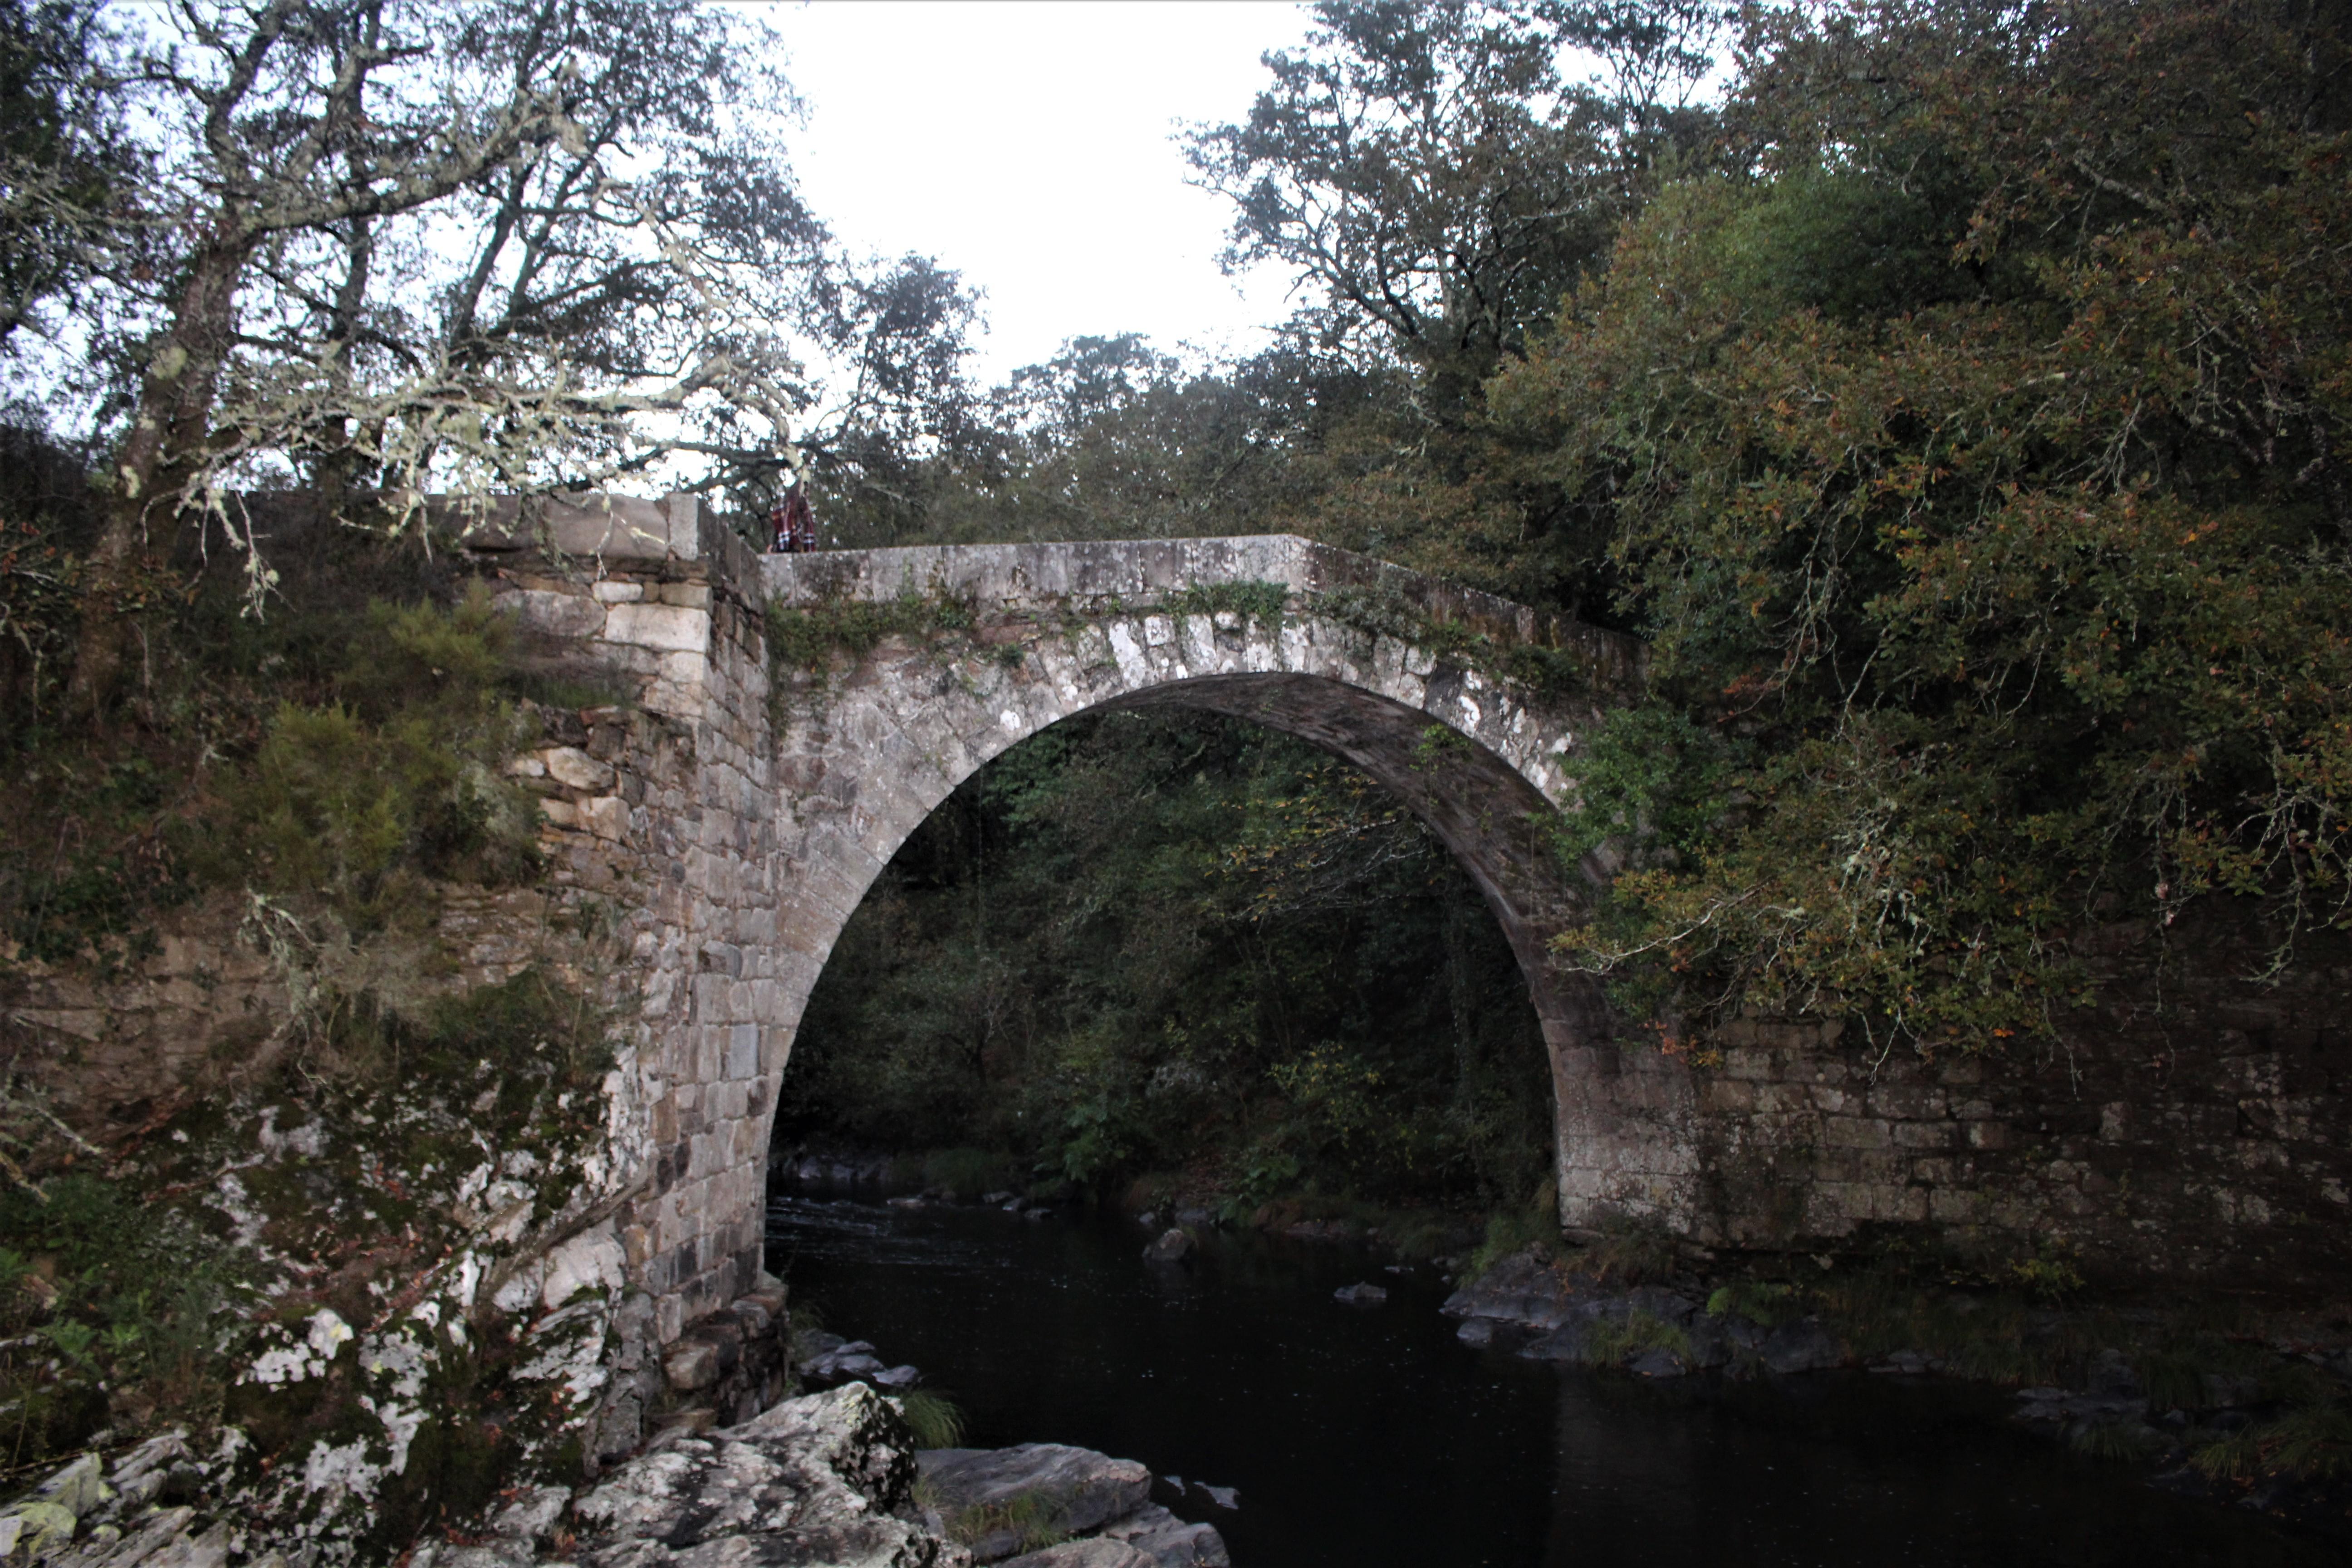 A Ponte do Demo está situado a 200 metros del monasterio |©Paula Martínez Graña